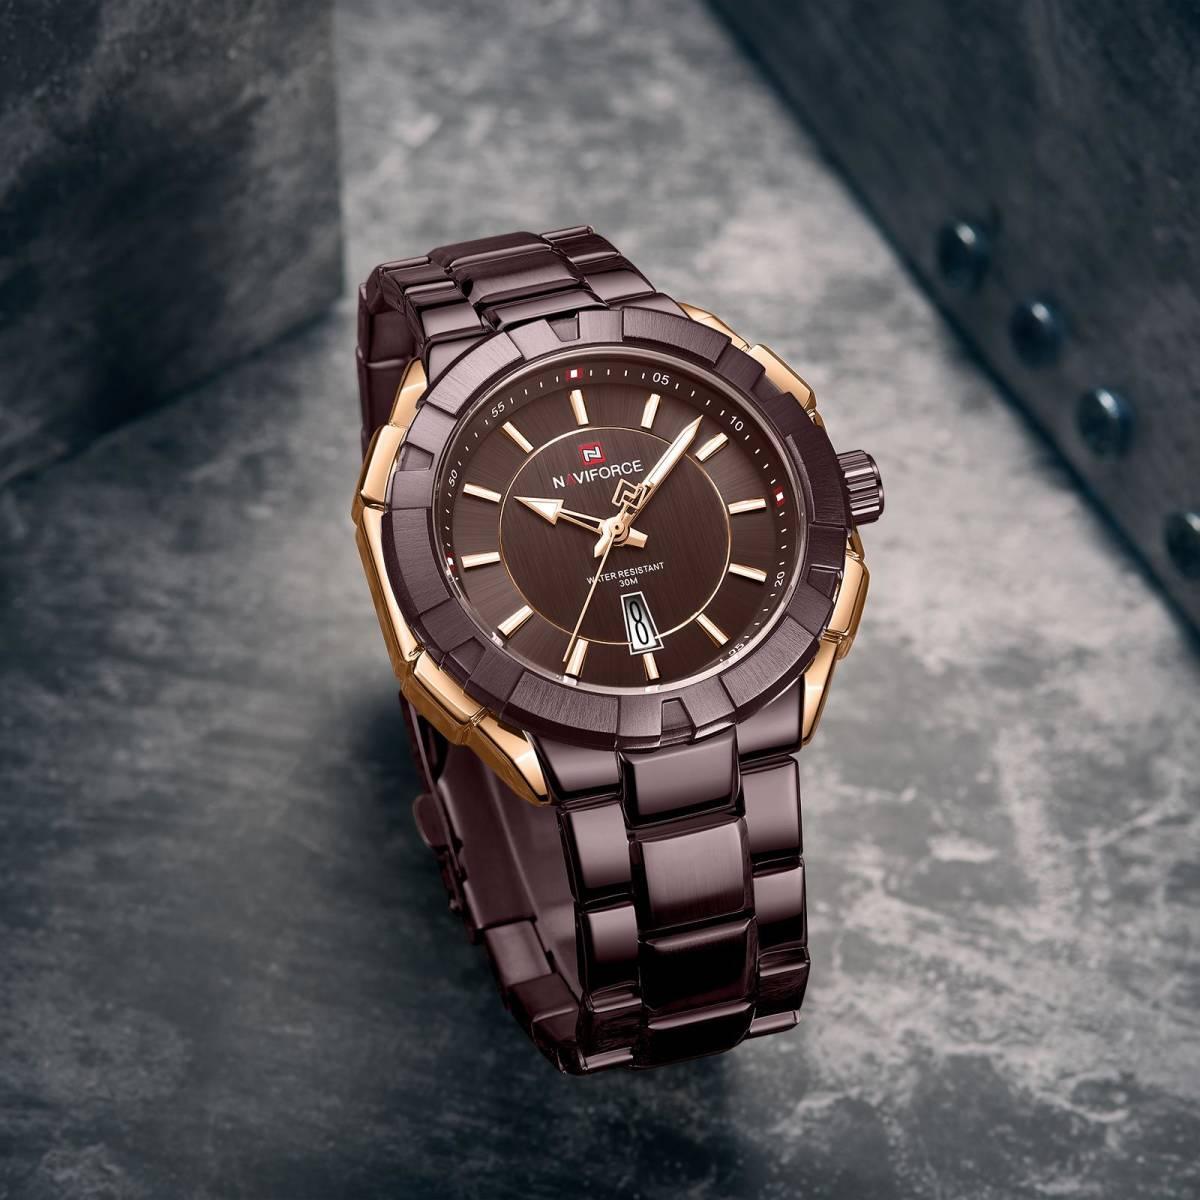 Naviforce ファッション男性高級ブランドのスポーツクォーツ腕時計男性ビッグダイヤル時計防水時計レロジオ masculino_画像4